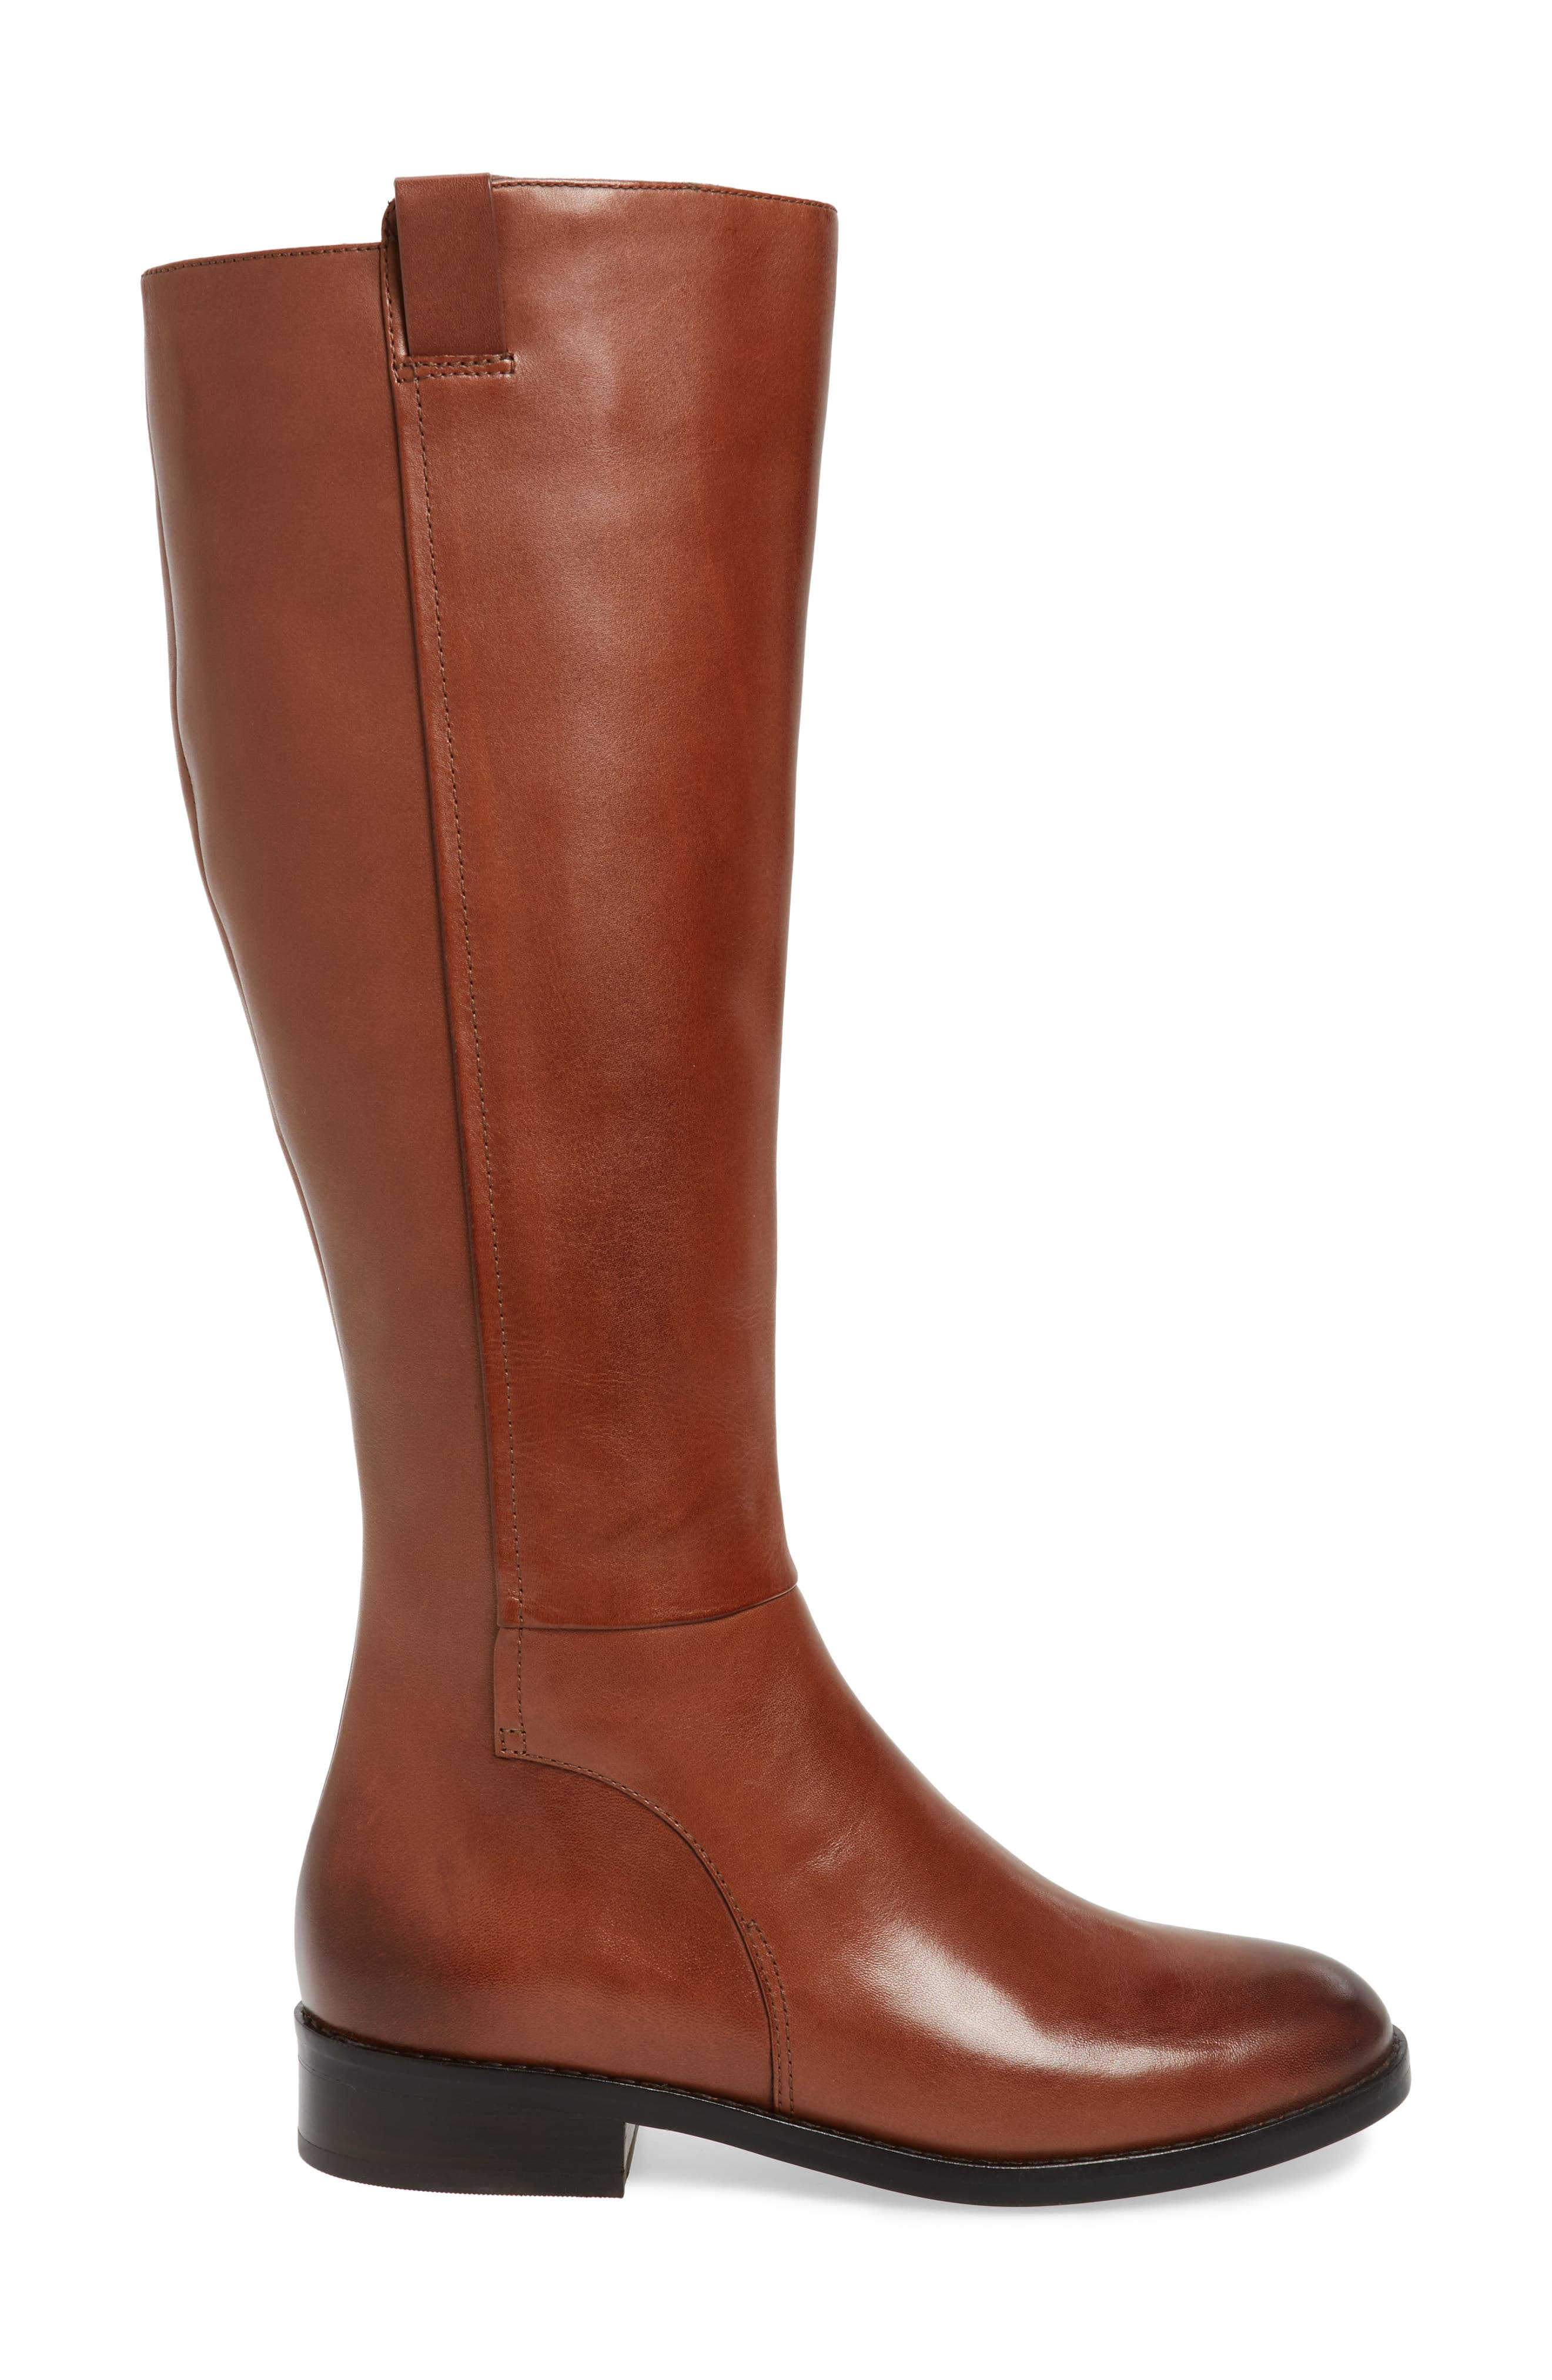 Katrina Riding Boot,                             Alternate thumbnail 4, color,                             Harvest Brown Leather